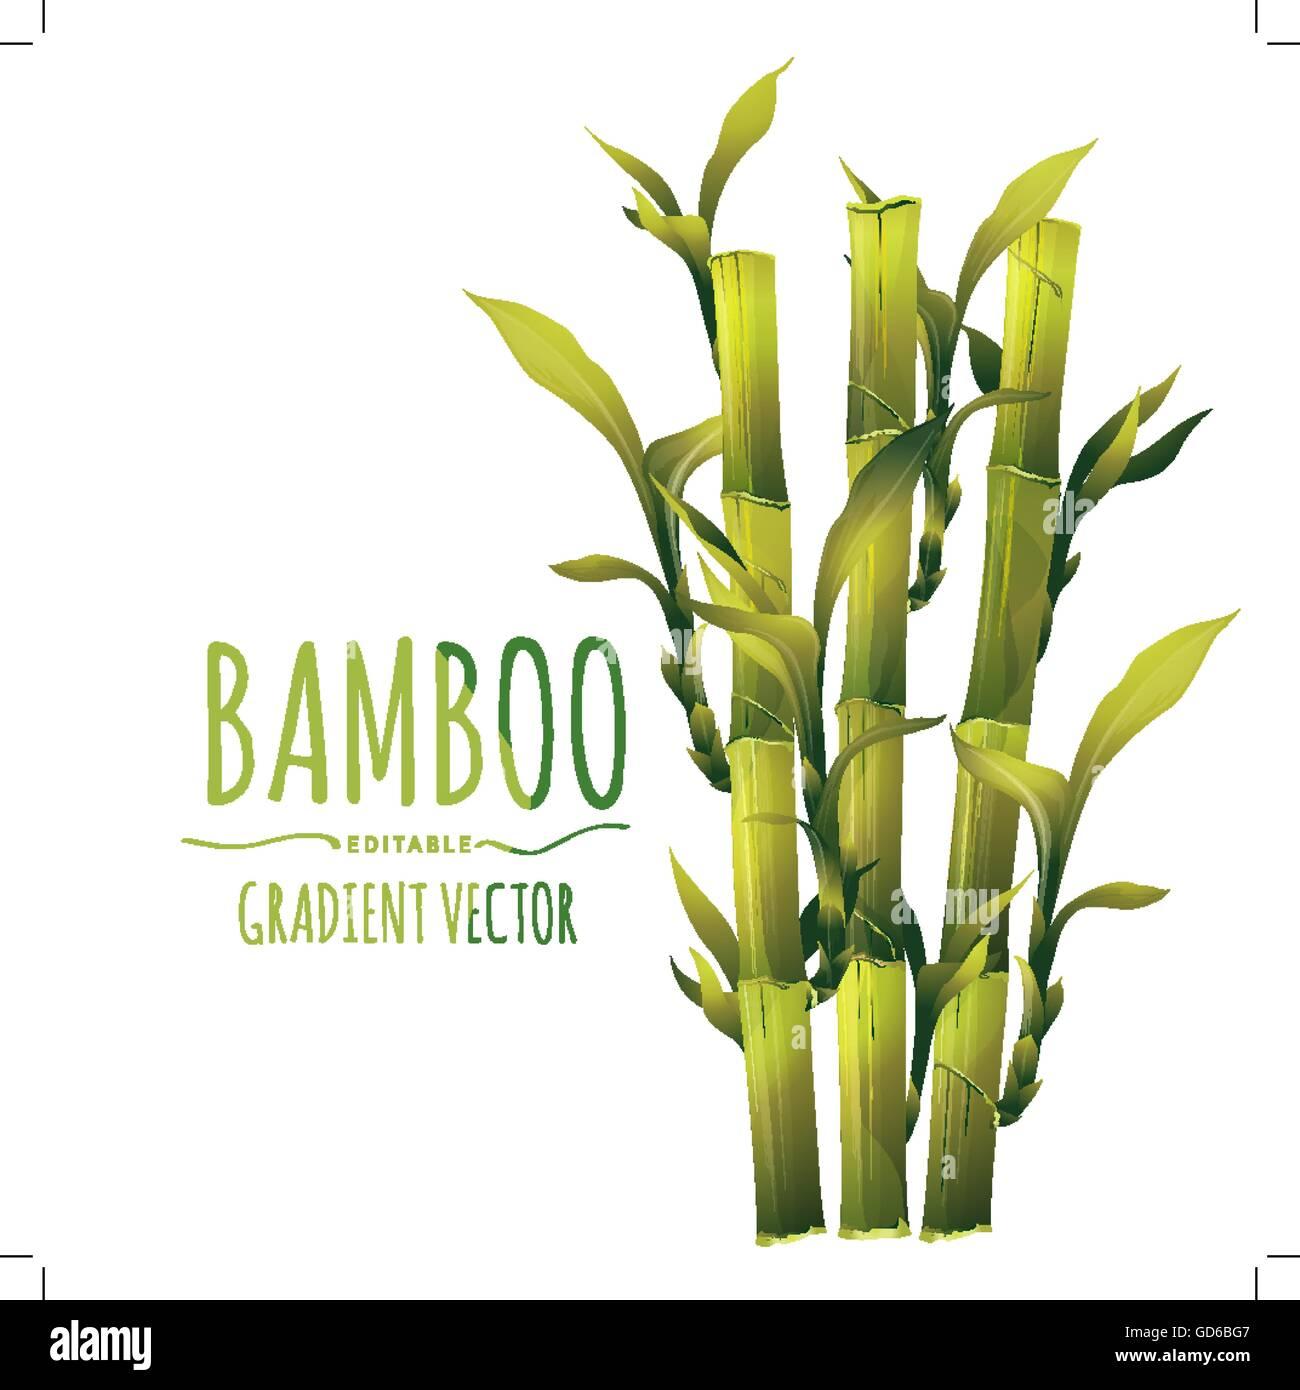 Bambus Vektor Illustration Vektor Abbildung Bild 111393527 Alamy